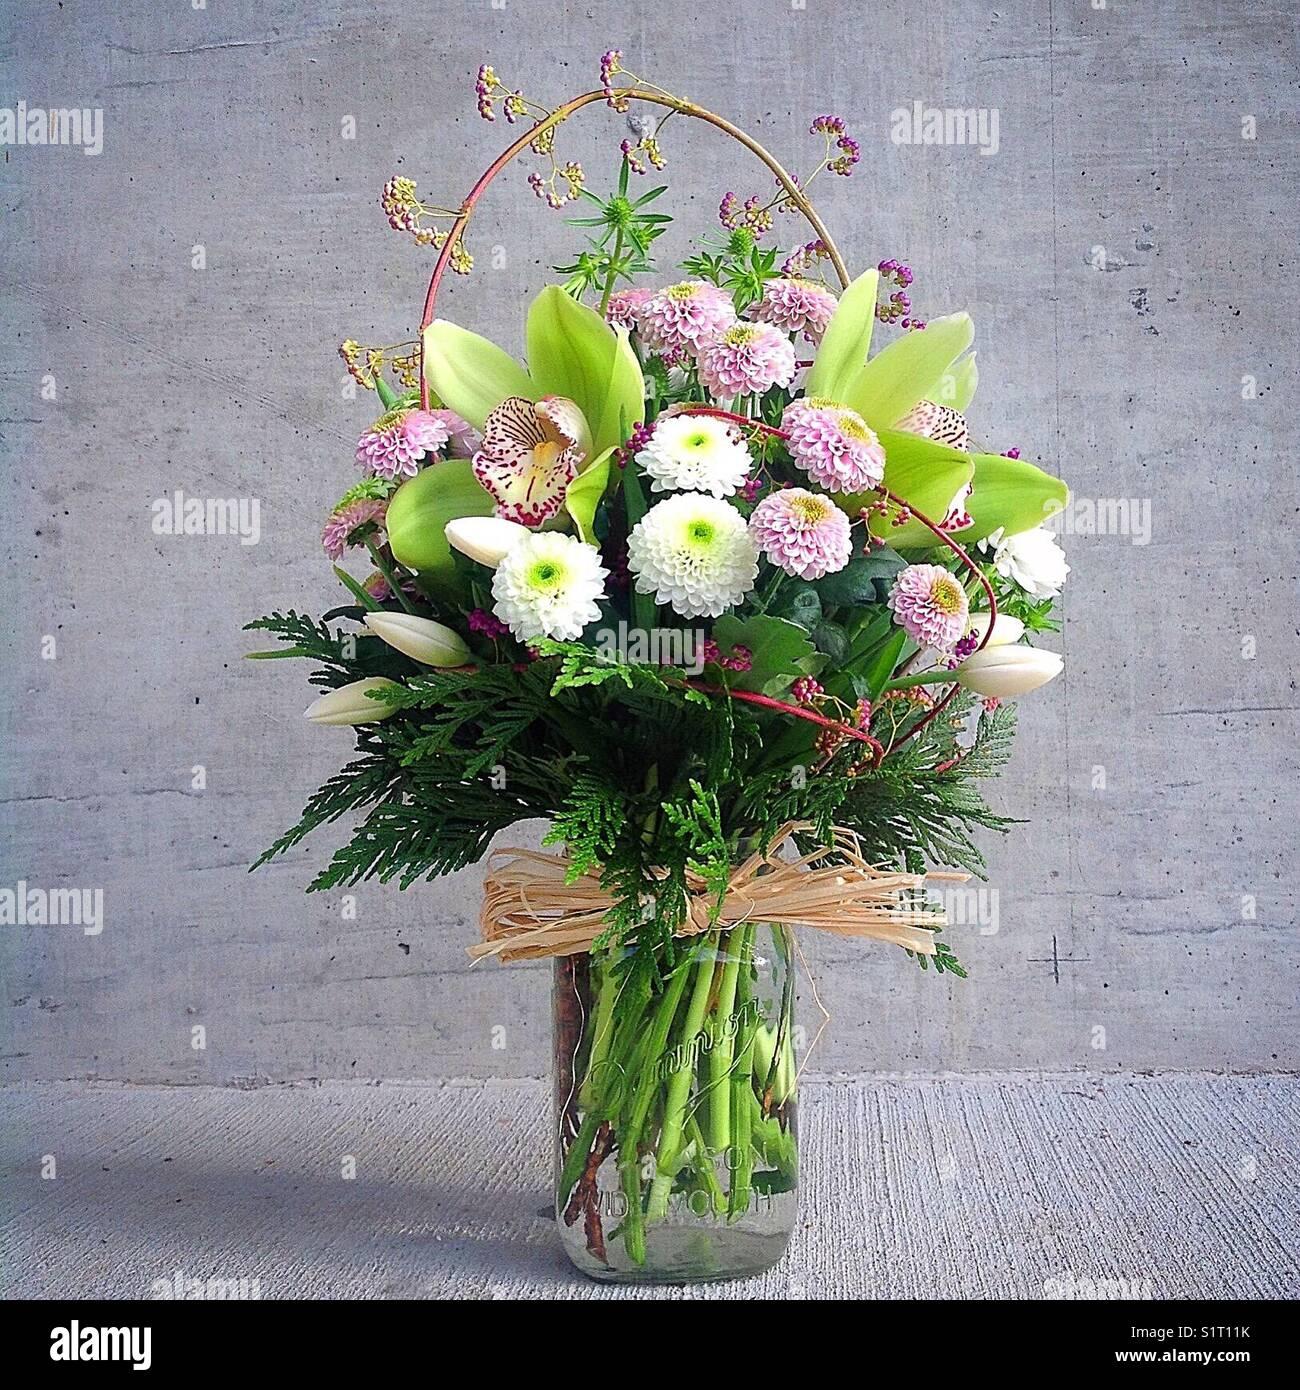 Mason jar with white, purple and green flower arrangement